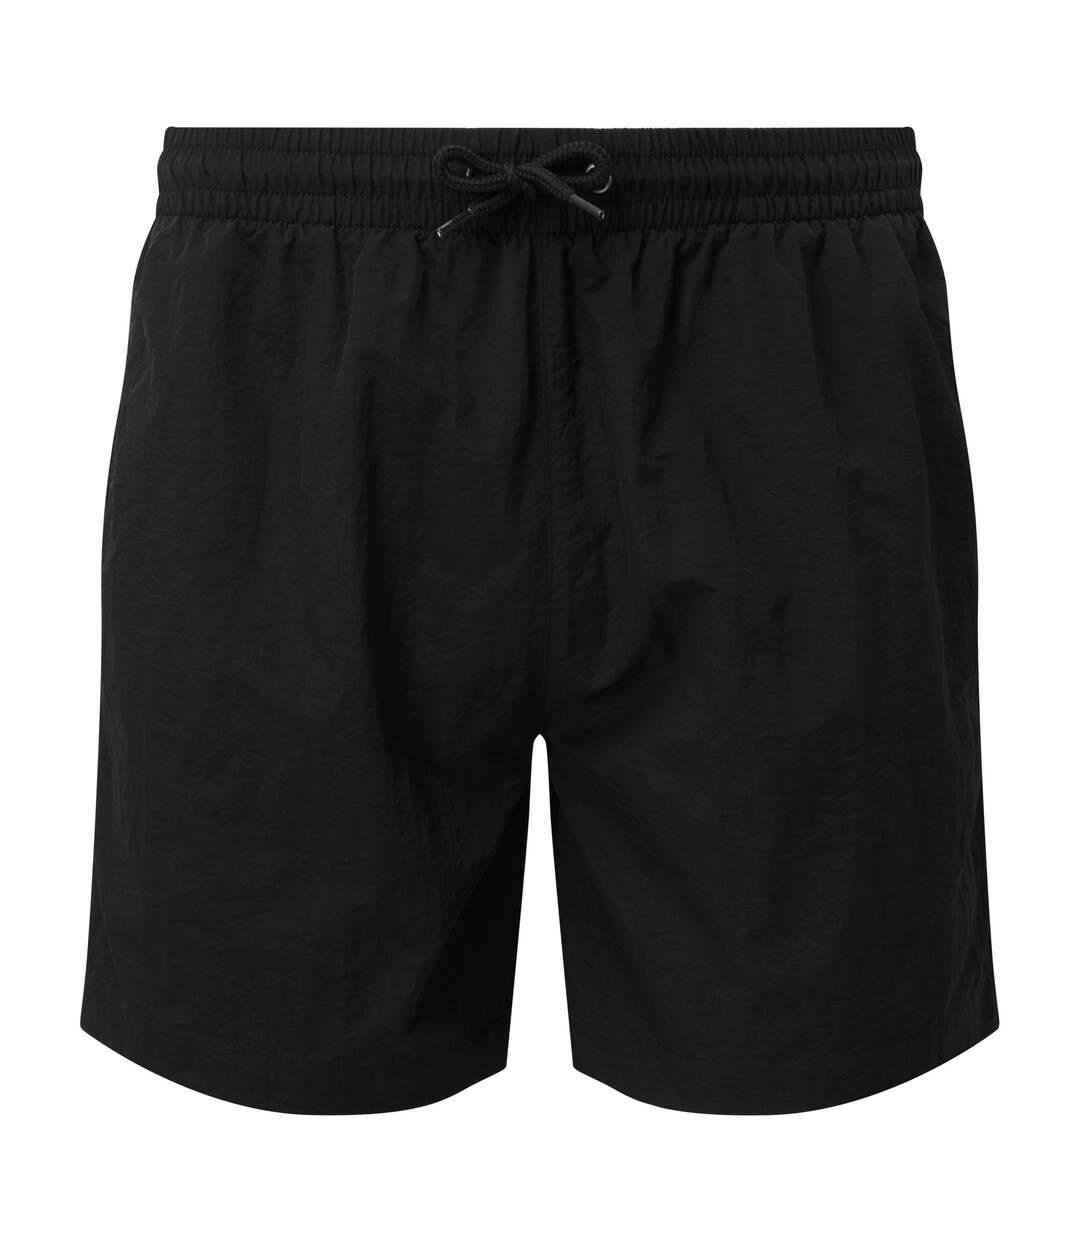 Asquith & Fox Mens Swim Shorts (Purple/Black) - UTRW6242